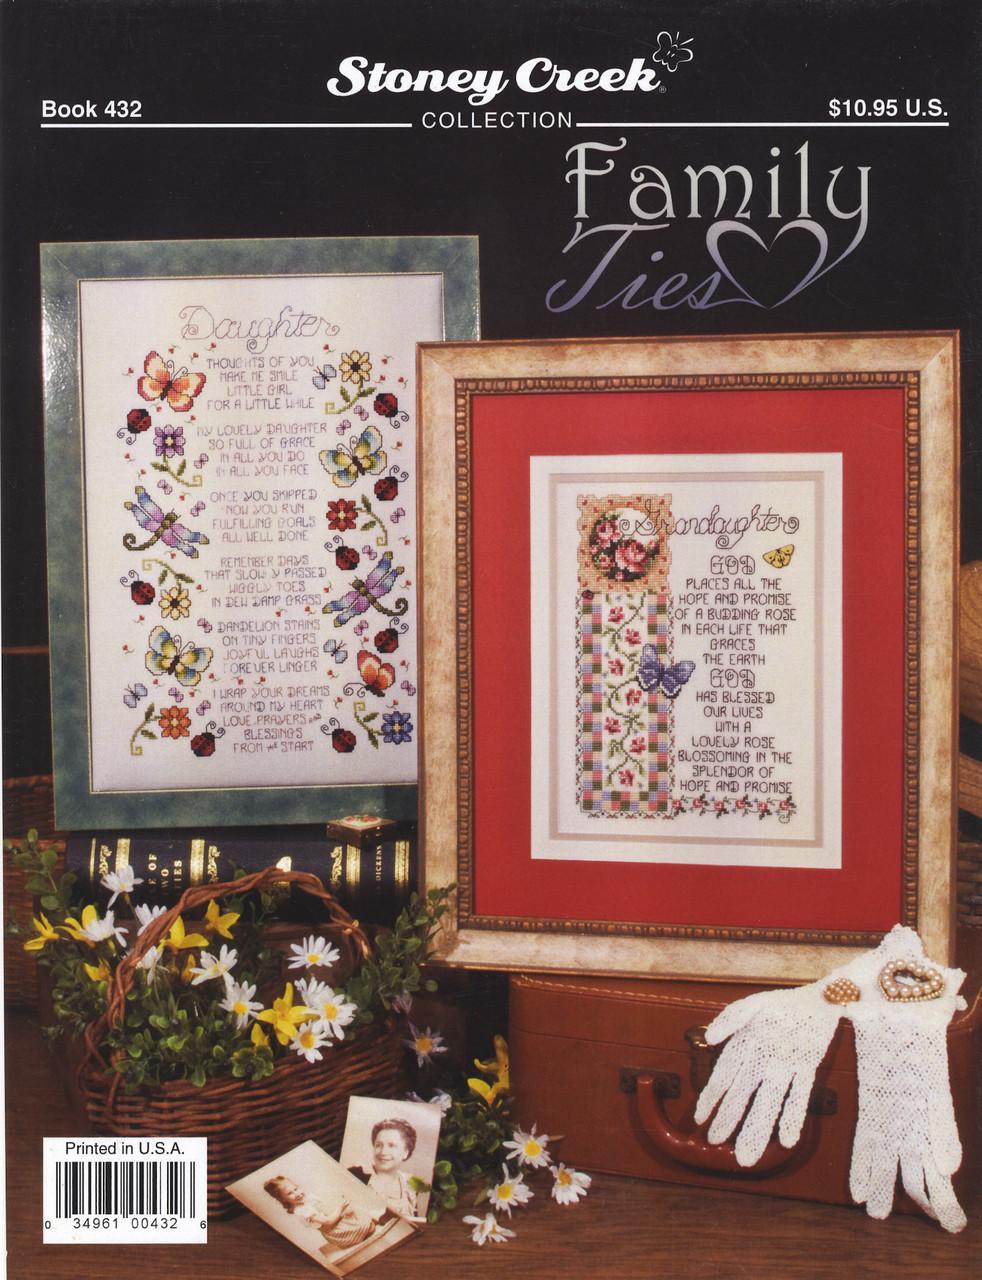 Stoney Creek - Family Ties